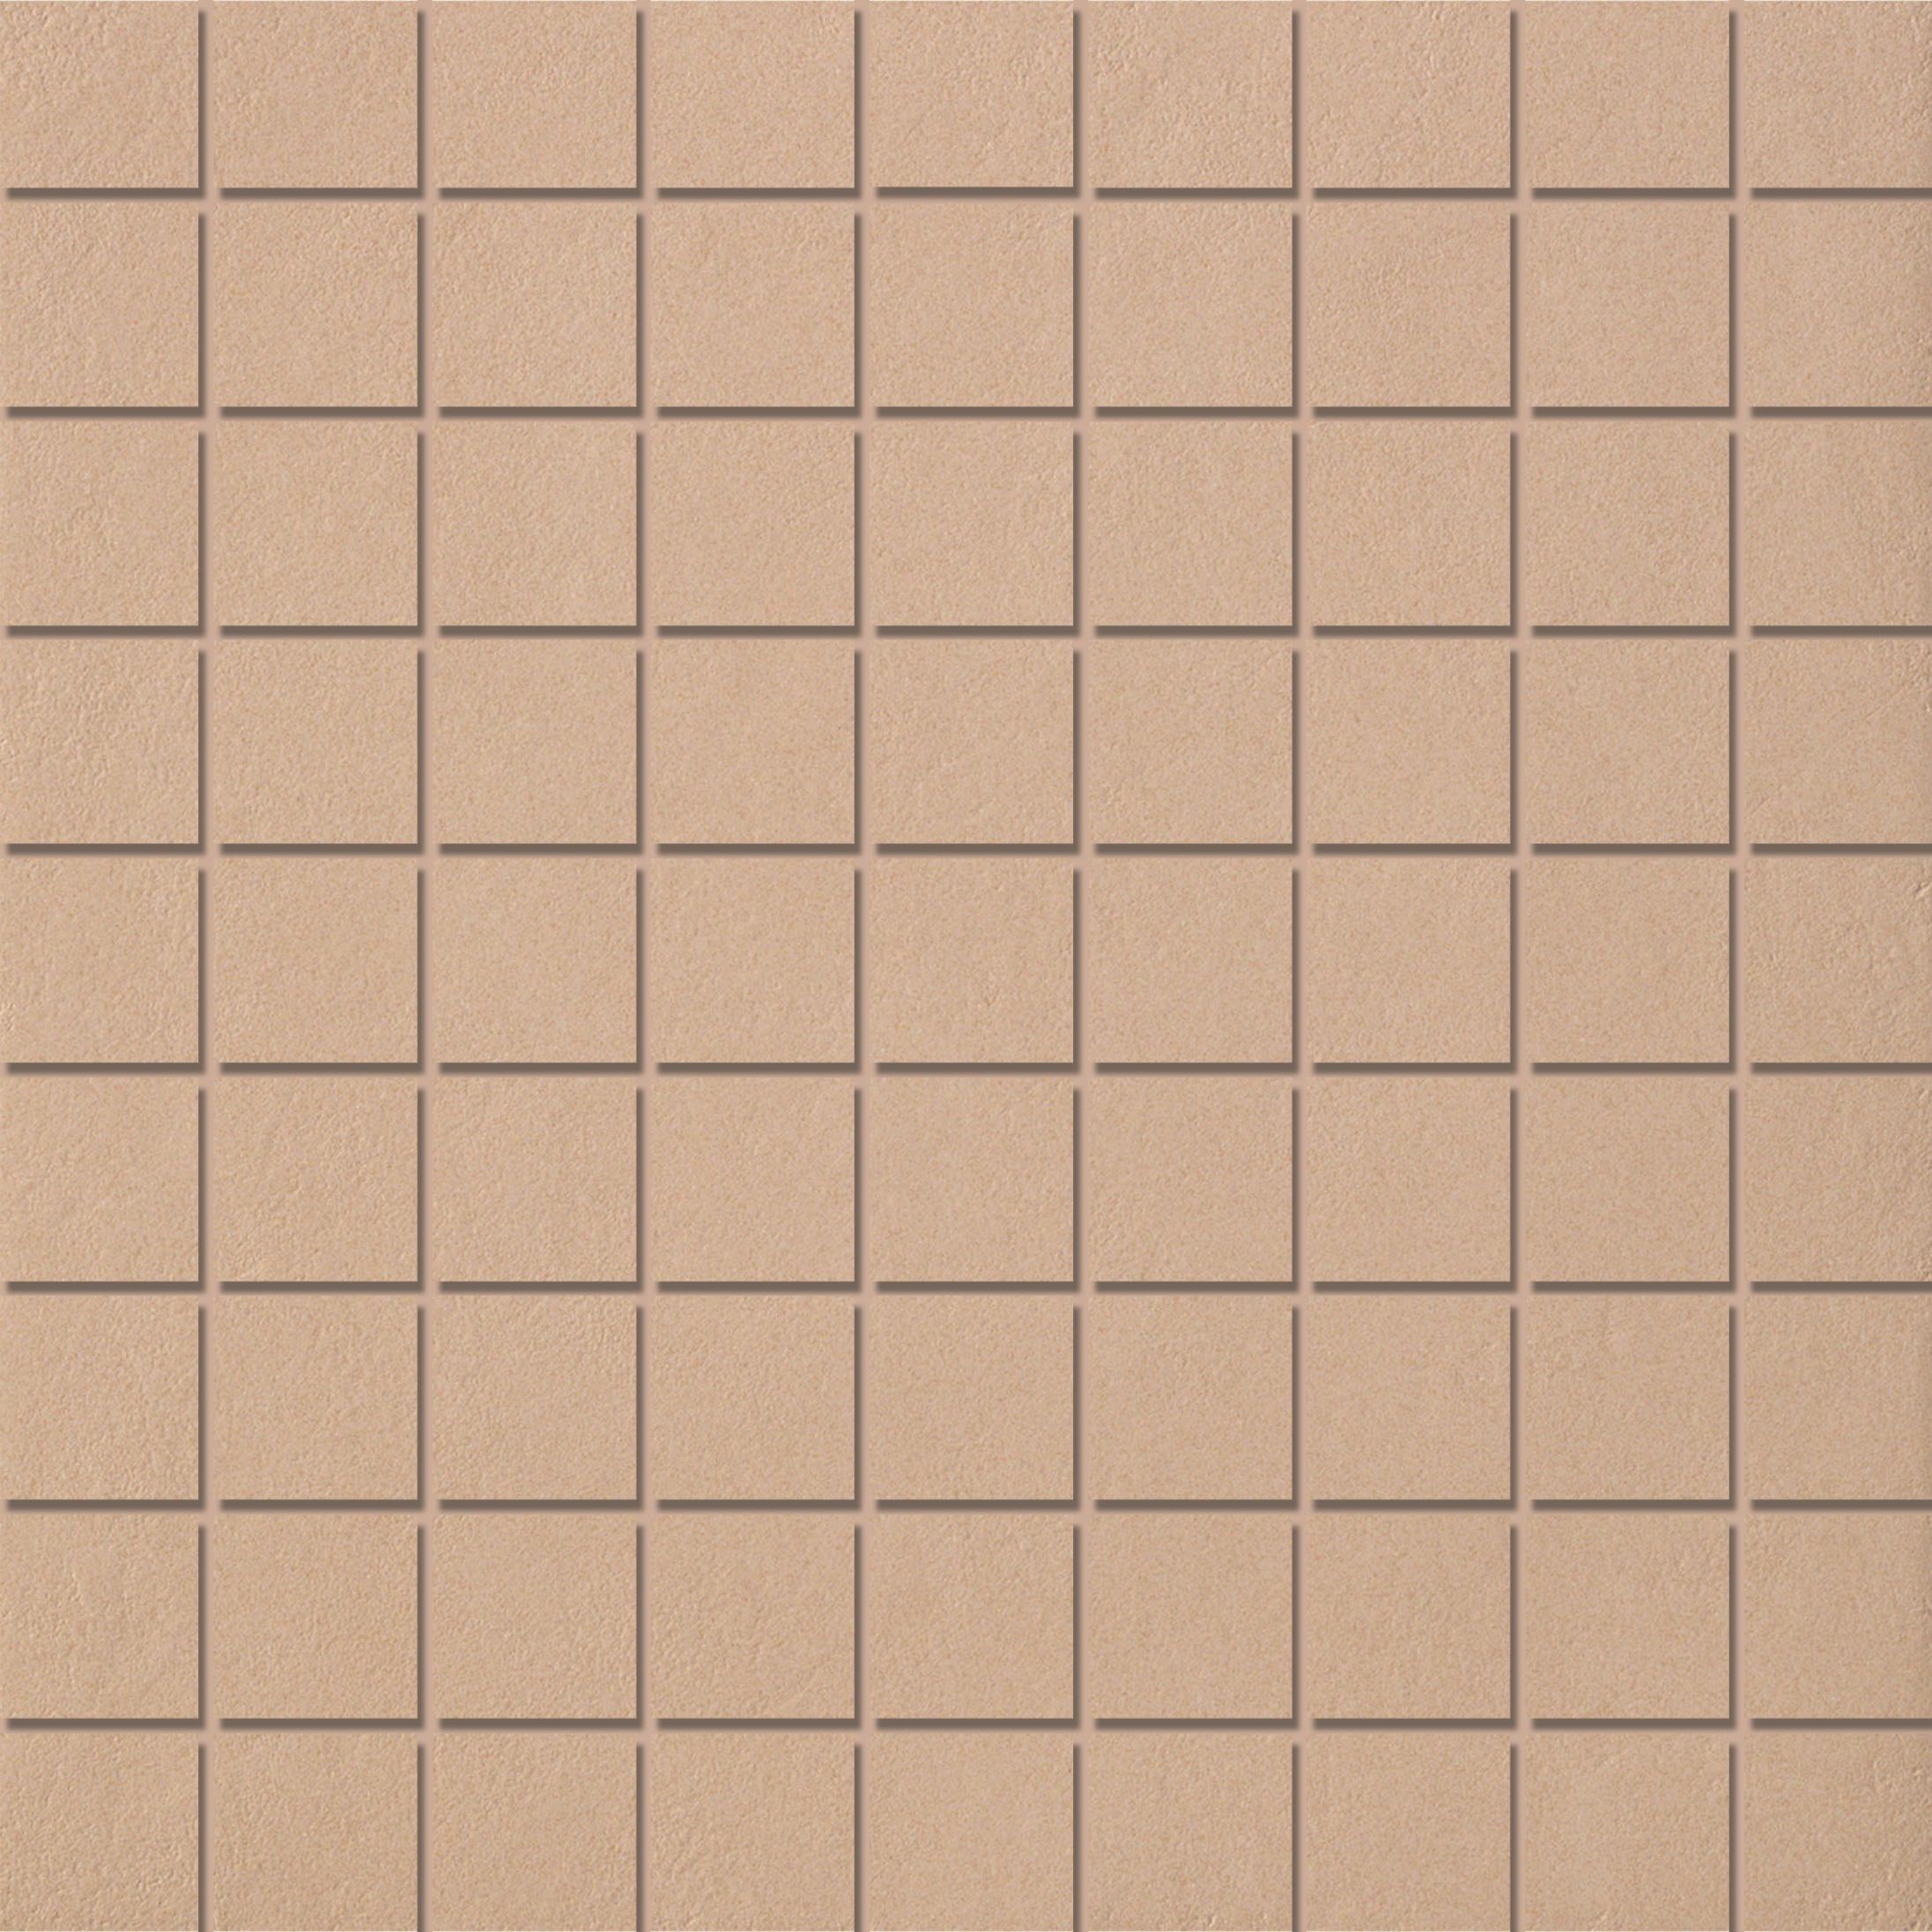 Mosaic 3,1X3,1 Light Brown